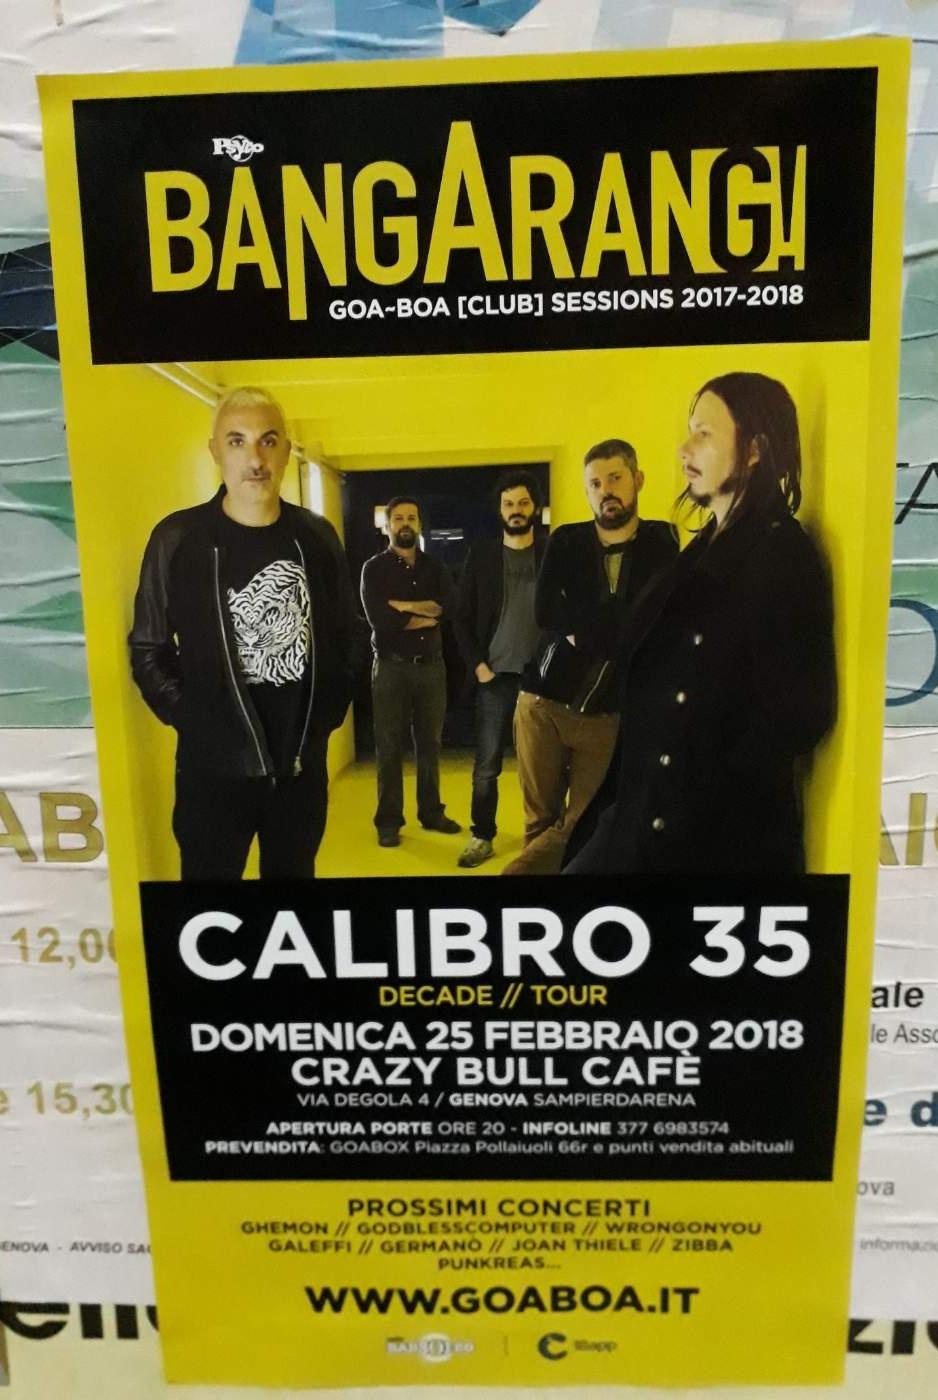 Bangarang - Calibro 35 Crazy Bull Café Via Eustachio Degola 4, 16151 Genova Dal 25/02/2018 Al 25/02/2018 20:00 - 00:00